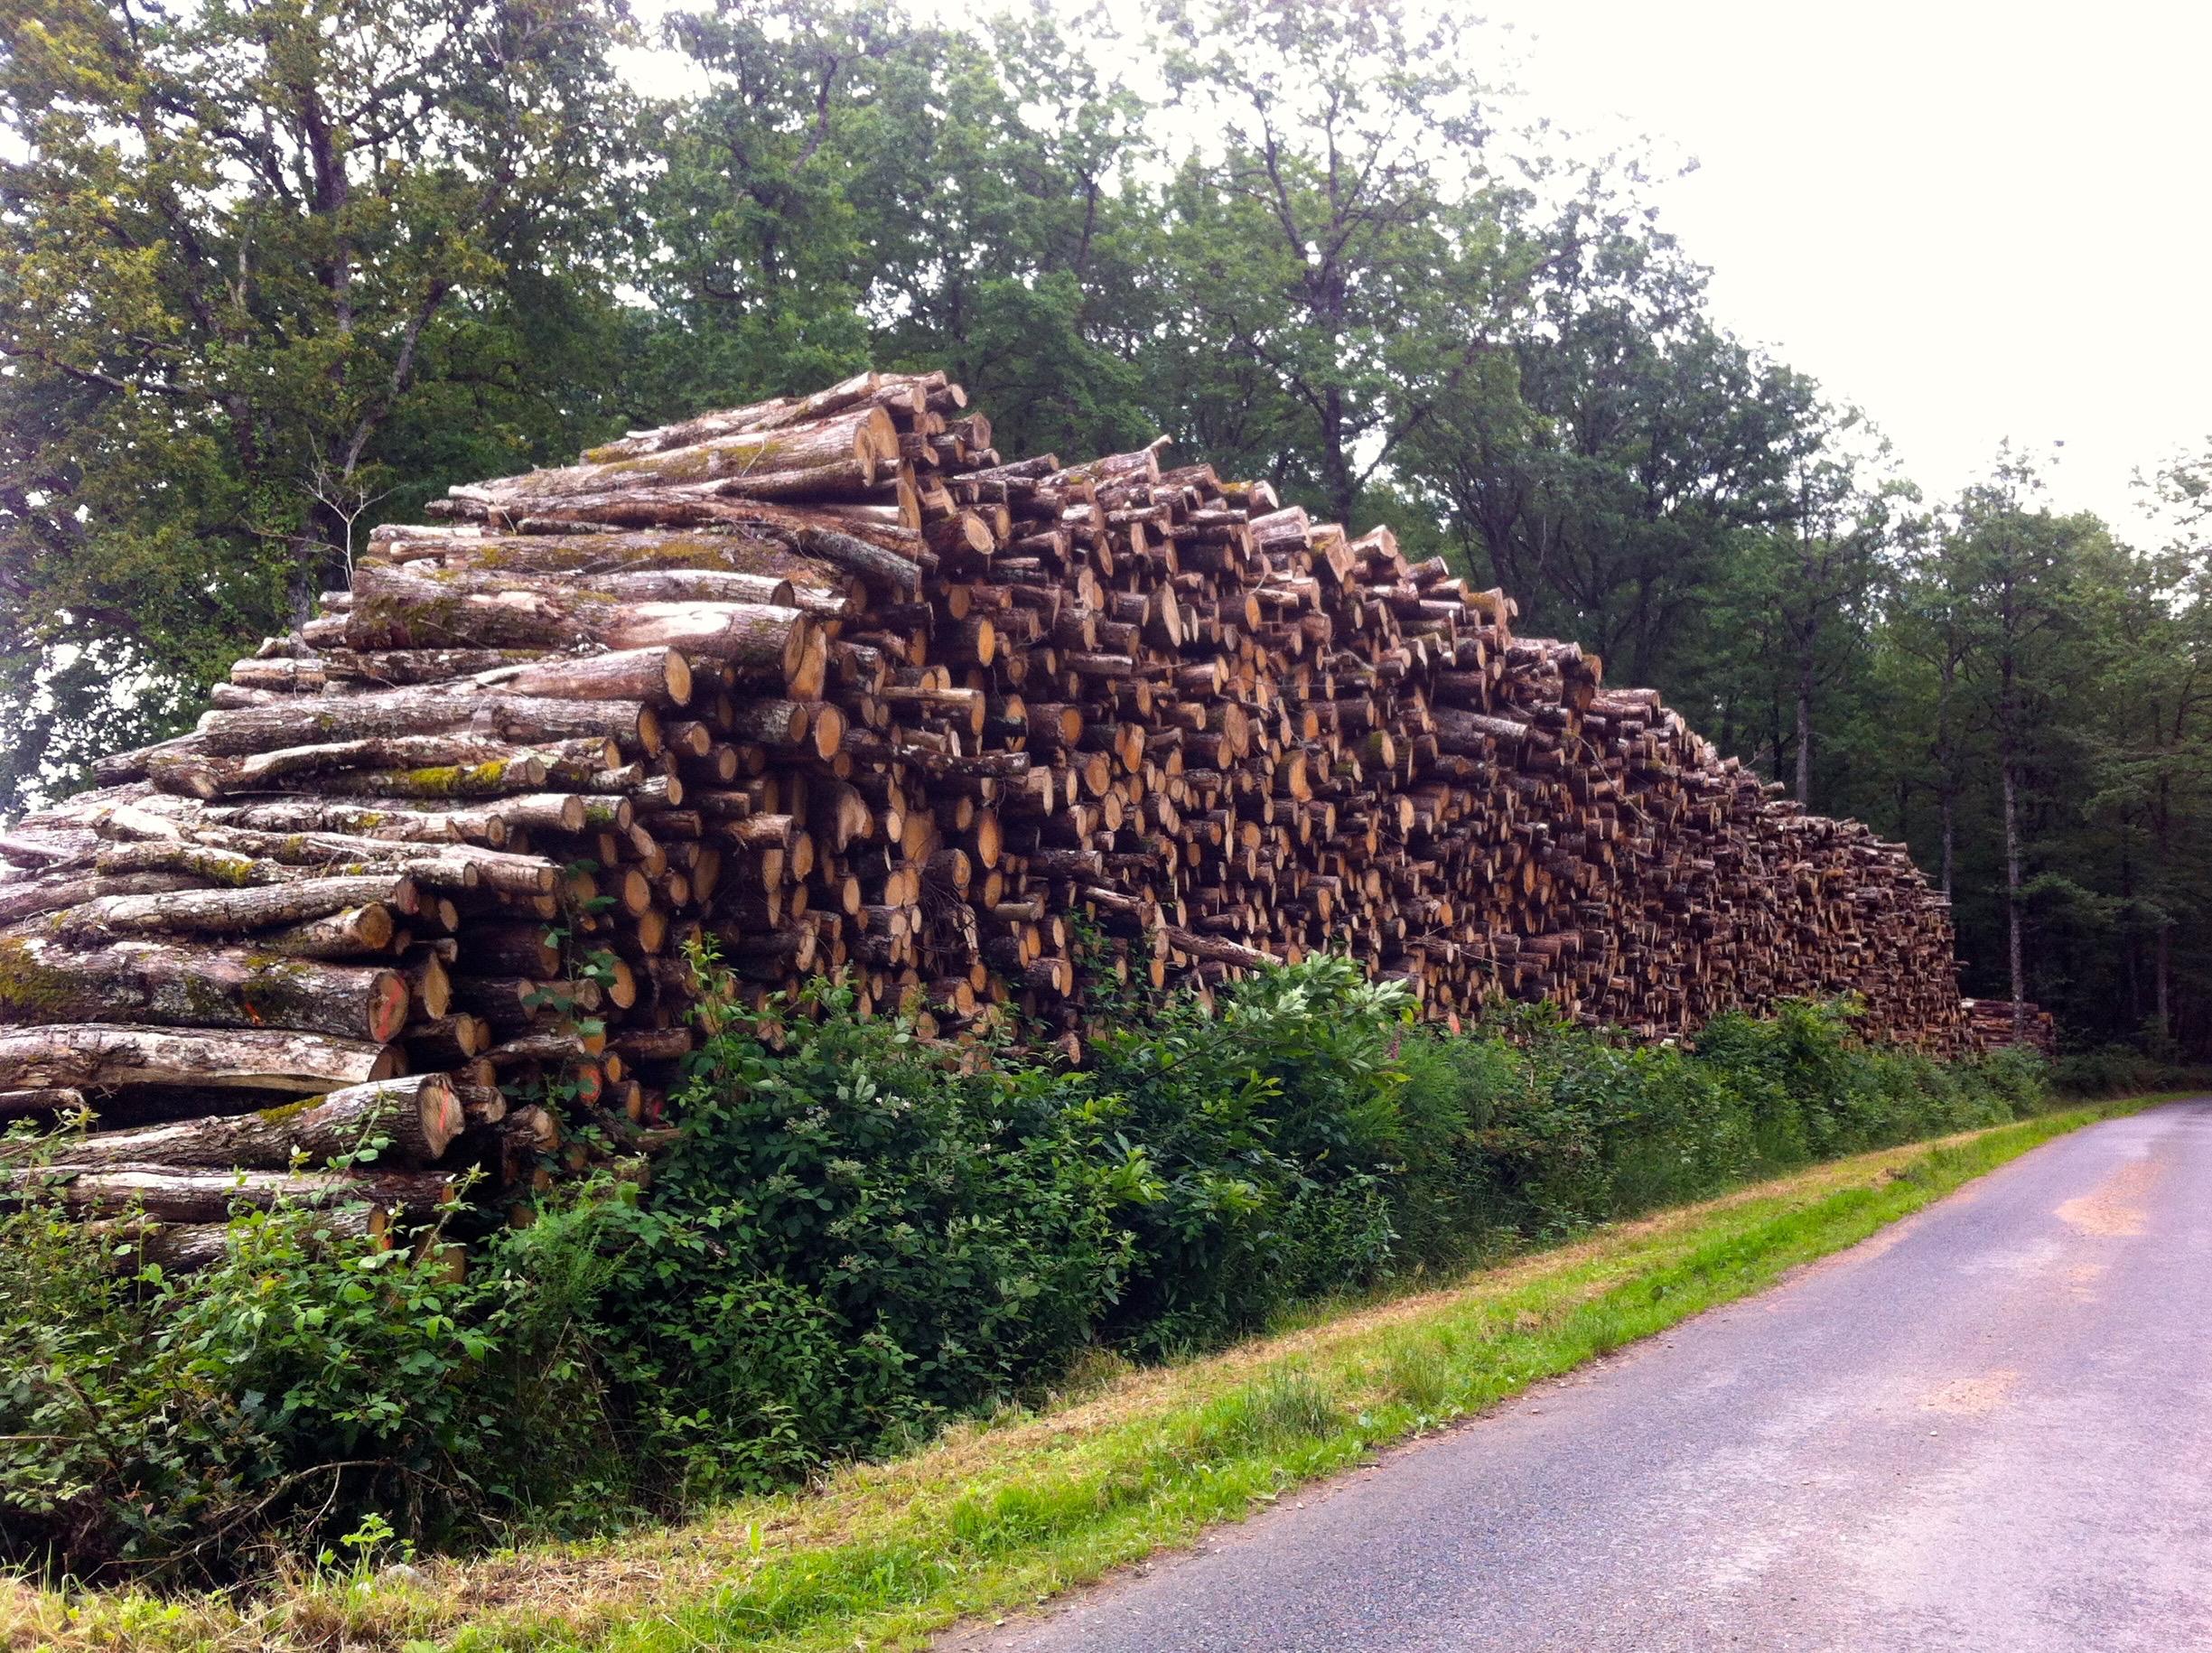 An even larger log pile